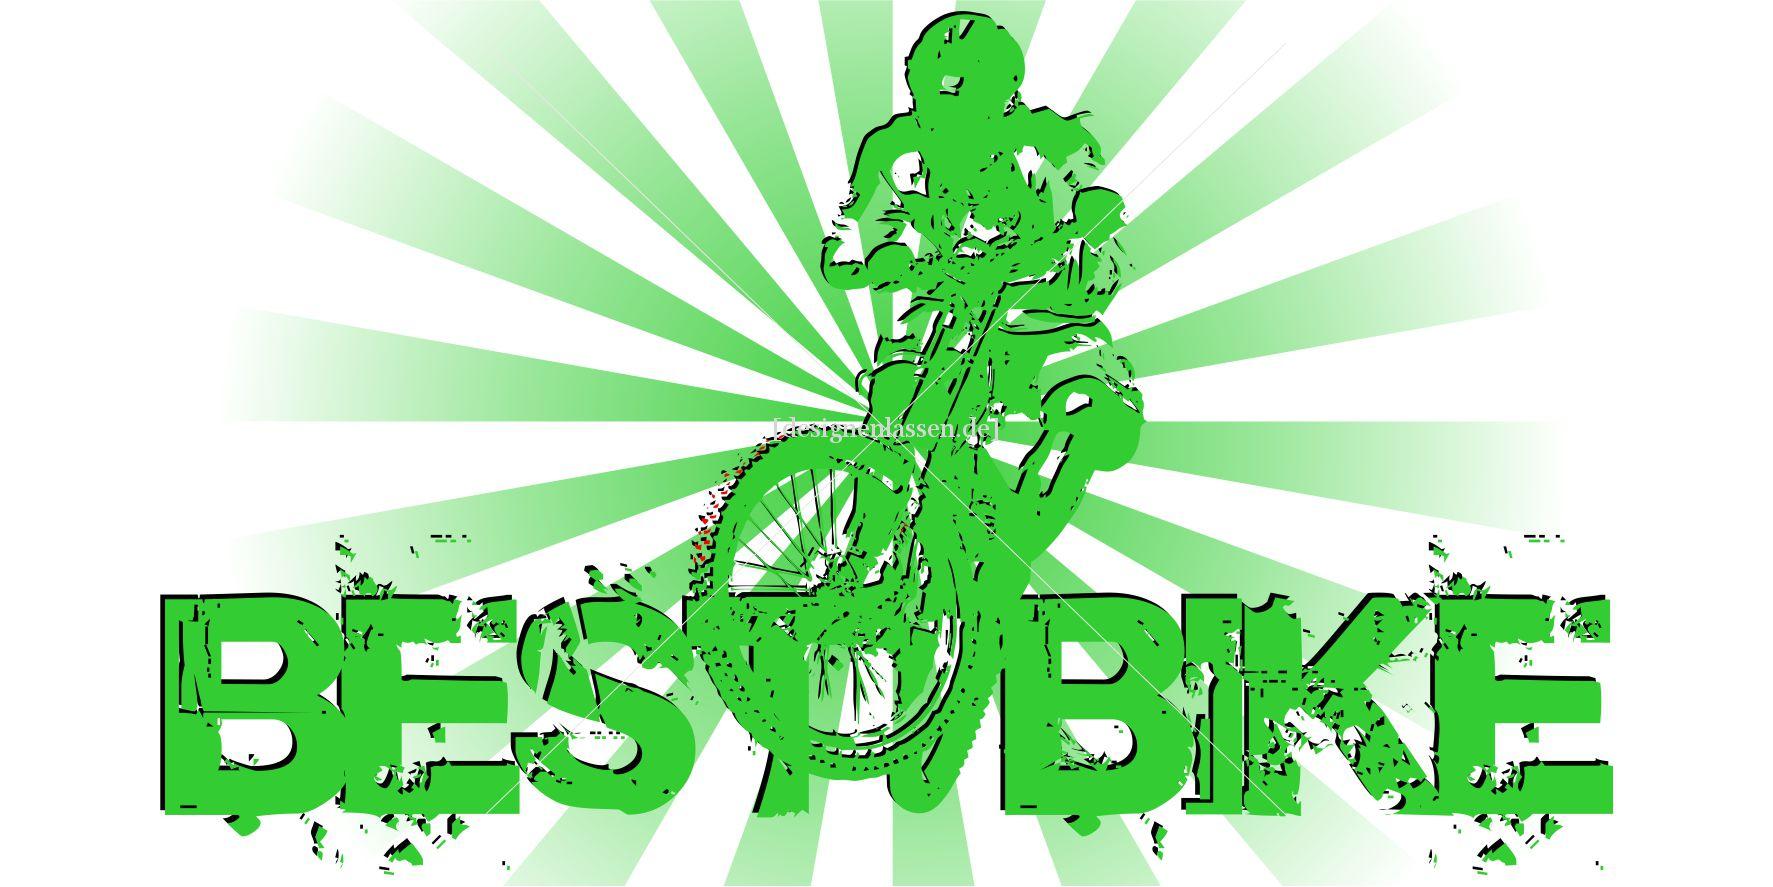 design #30 of BBH